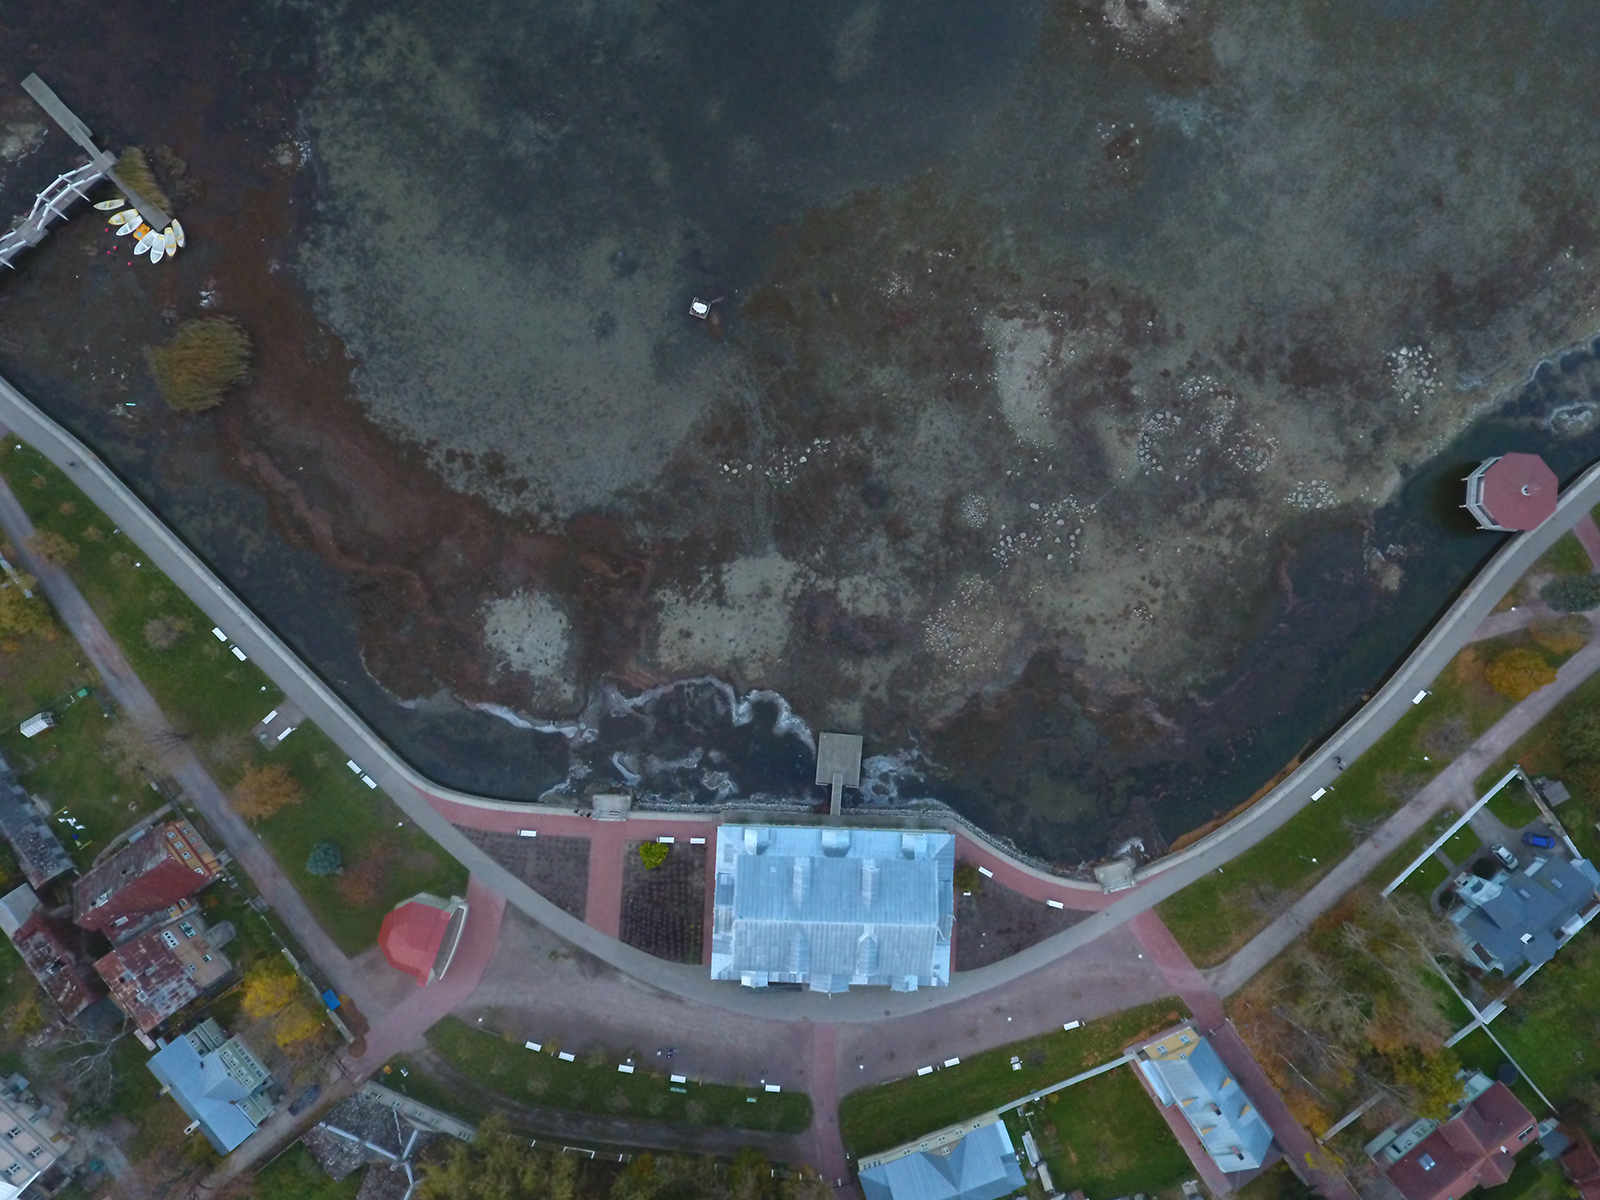 Drone Footage: Haapsalu Promenade Low Water Level – October vs August